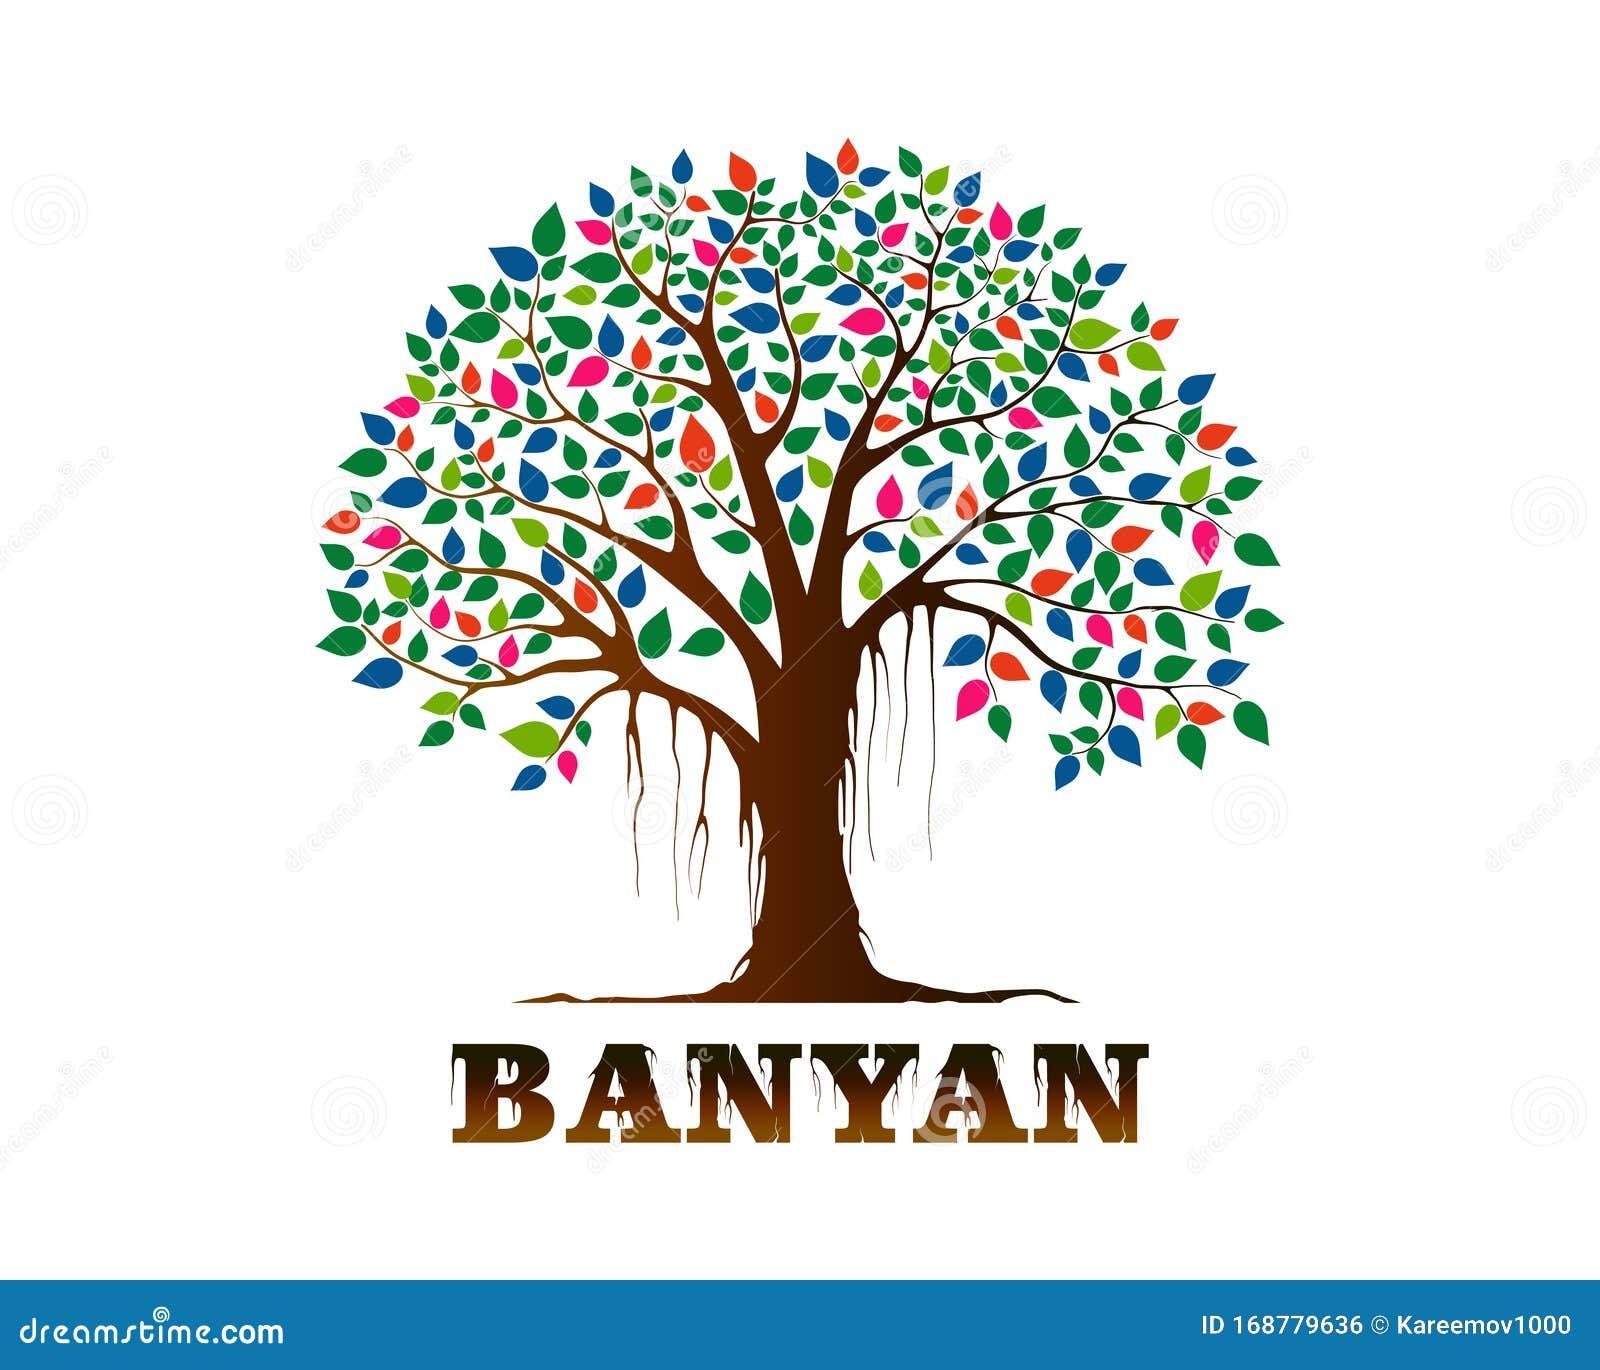 Banyan Tree Logo Vector Illustration Stock Vector Illustration Of Abstract Forest 168779636